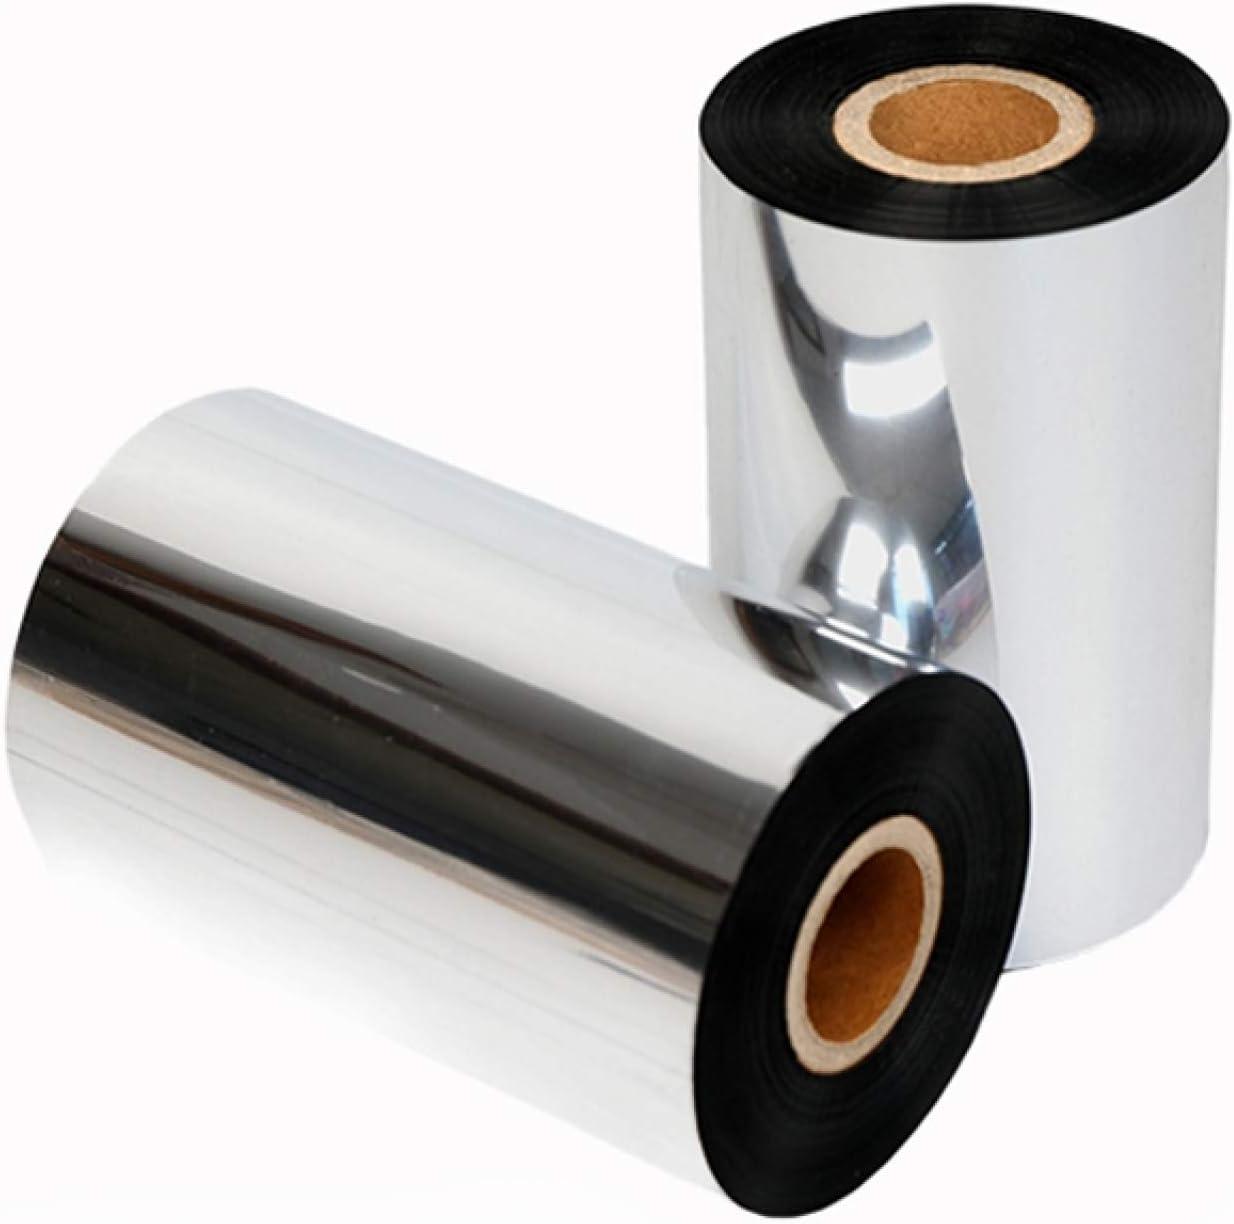 LUOKANGFAN LLKKFF Office Electronics Receipt Printers 2 PCS Wear-Resistant Mixed Wax-Based Printer Coated Paper Barcode Ribbon, Size: 8cmx300m Printer Accessory